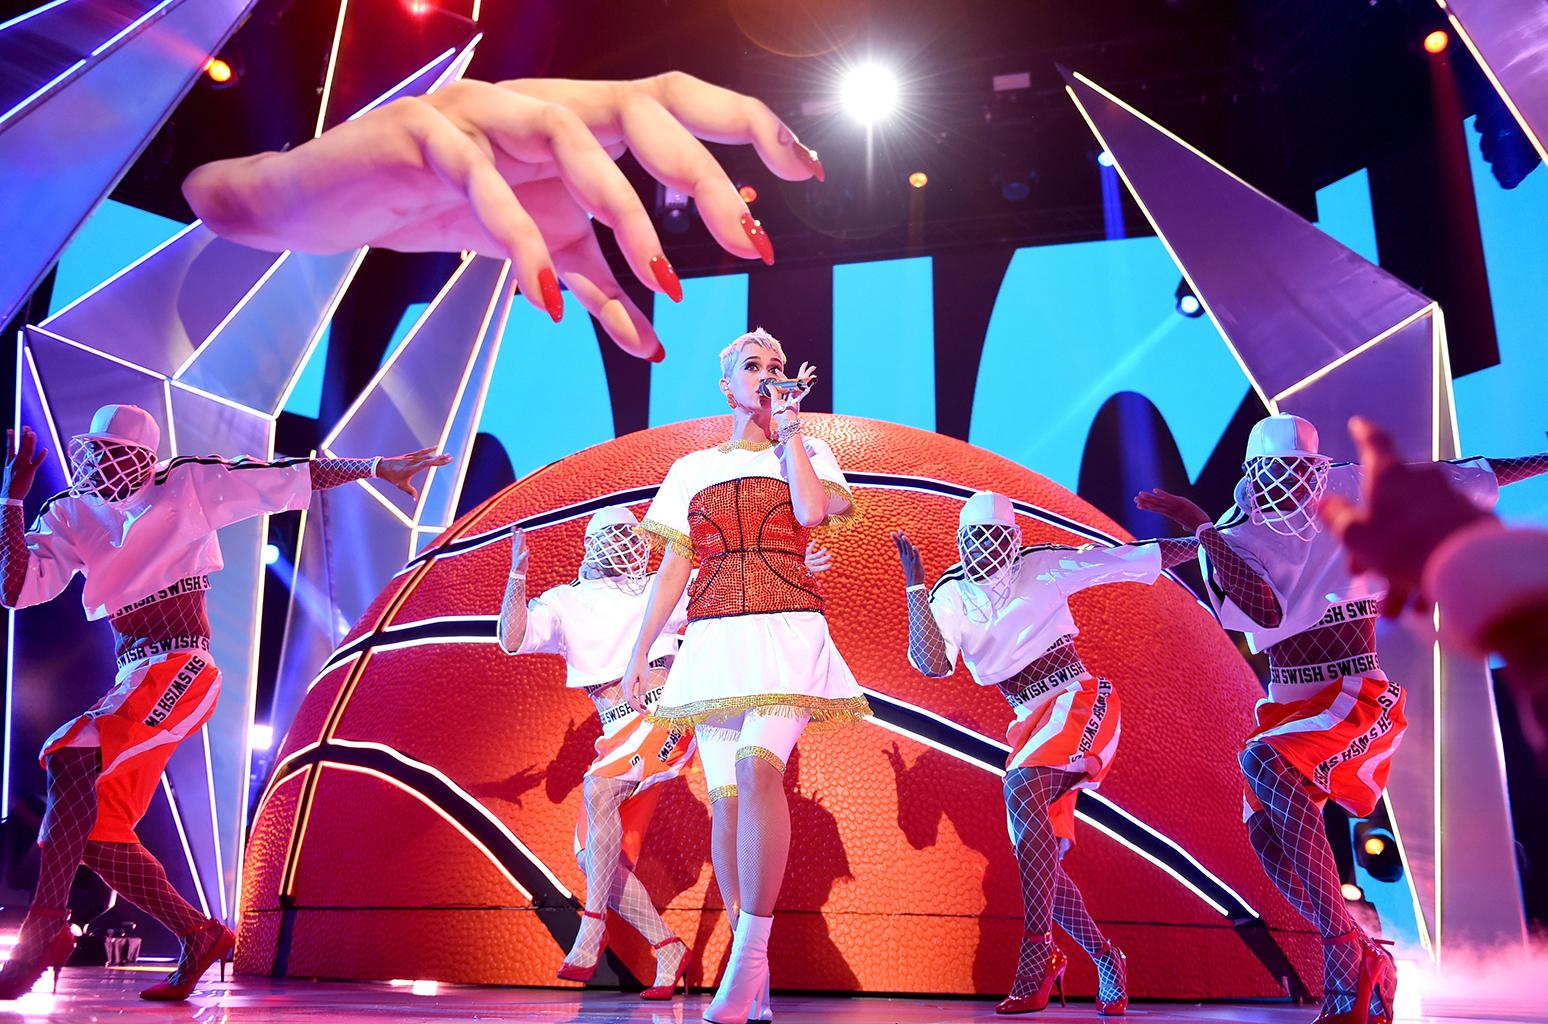 katy-perry-performance-mtv-vmas-show-2017-a-billboard-1548.jpg